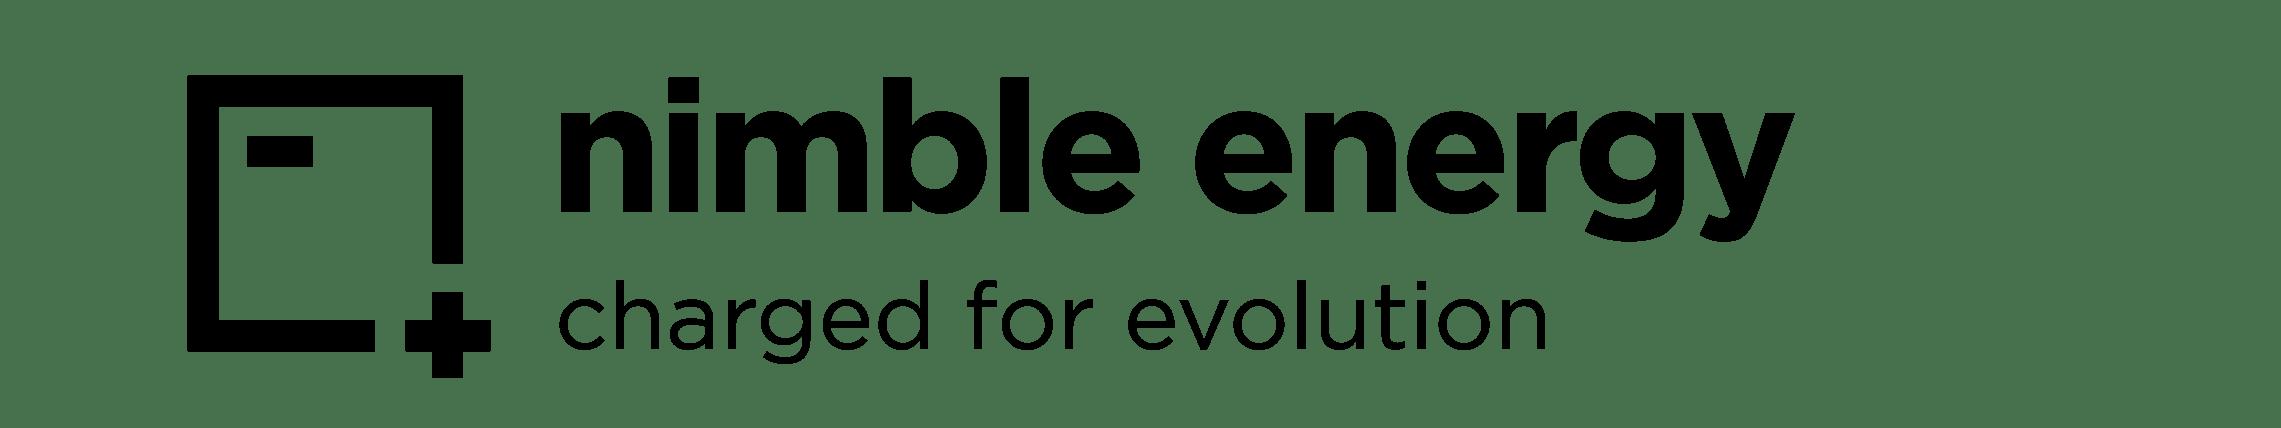 Nimble Energy logo